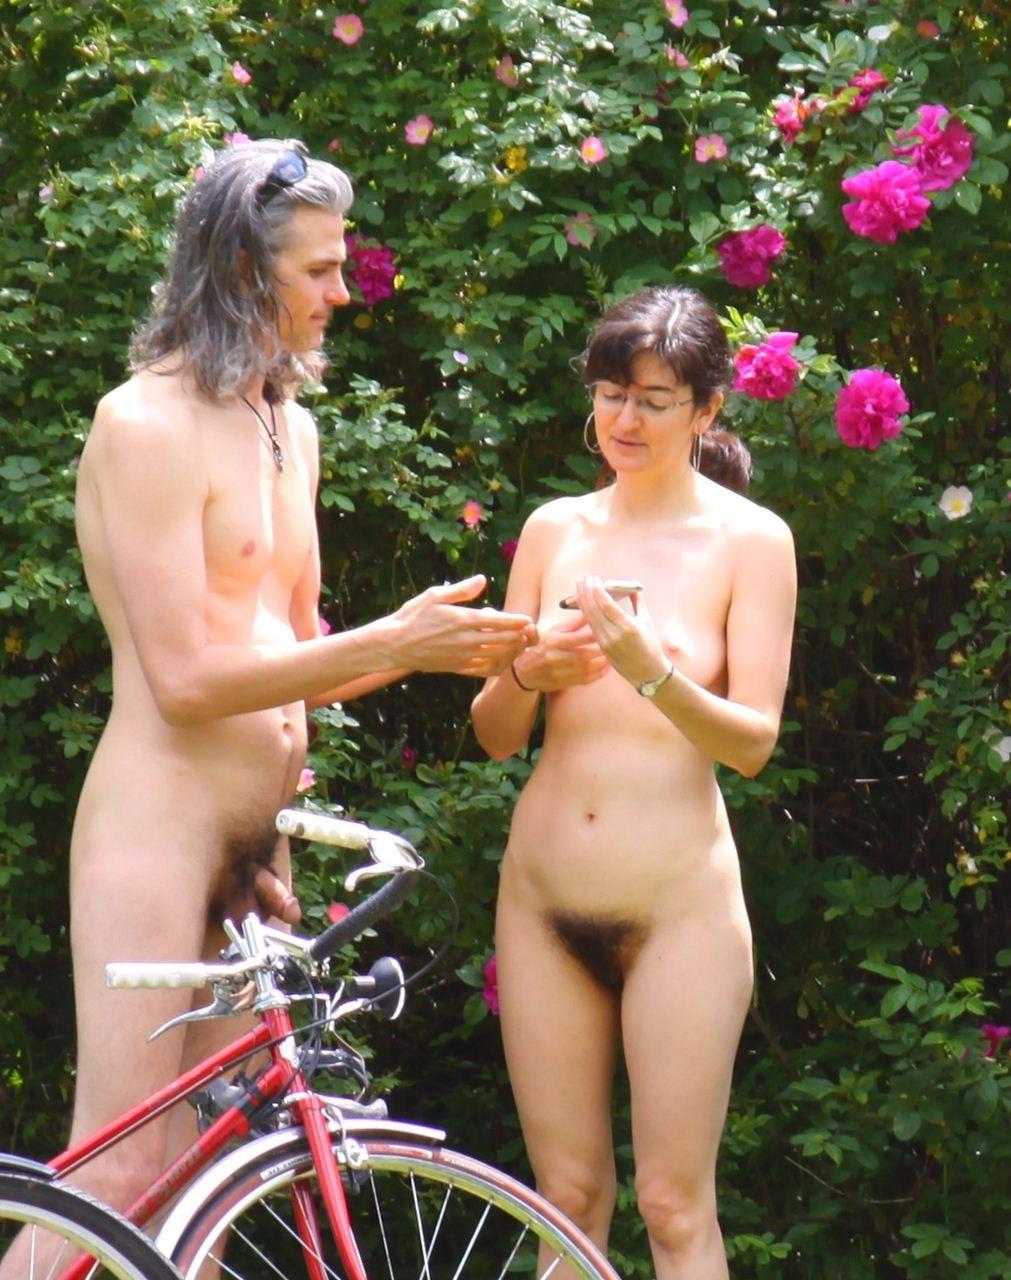 https://www.nudismlife.com/galleries/nudists_and_nude/the_most_natural_nudists/the_most_natural_nudists_0264.jpg